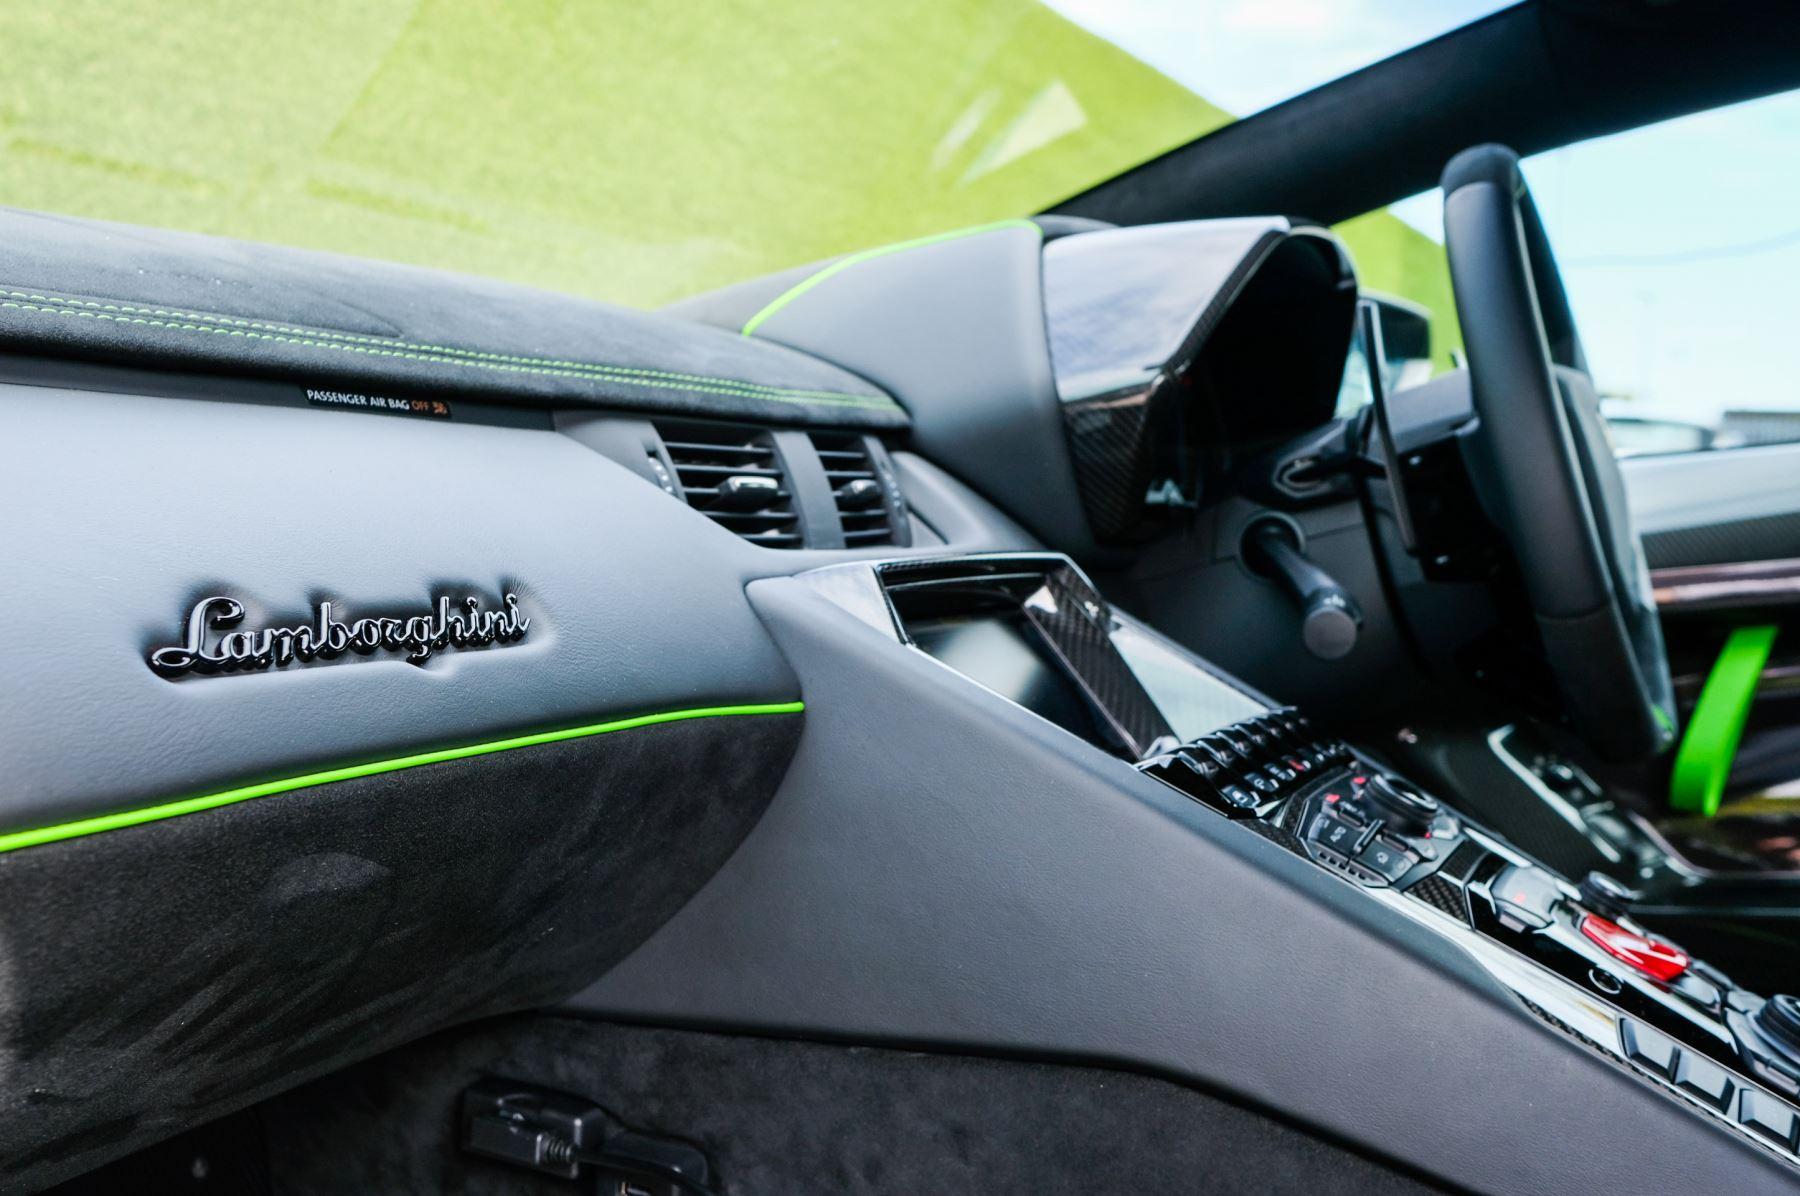 Lamborghini Aventador SVJ Coupe LP 770-4 SVJ image 17